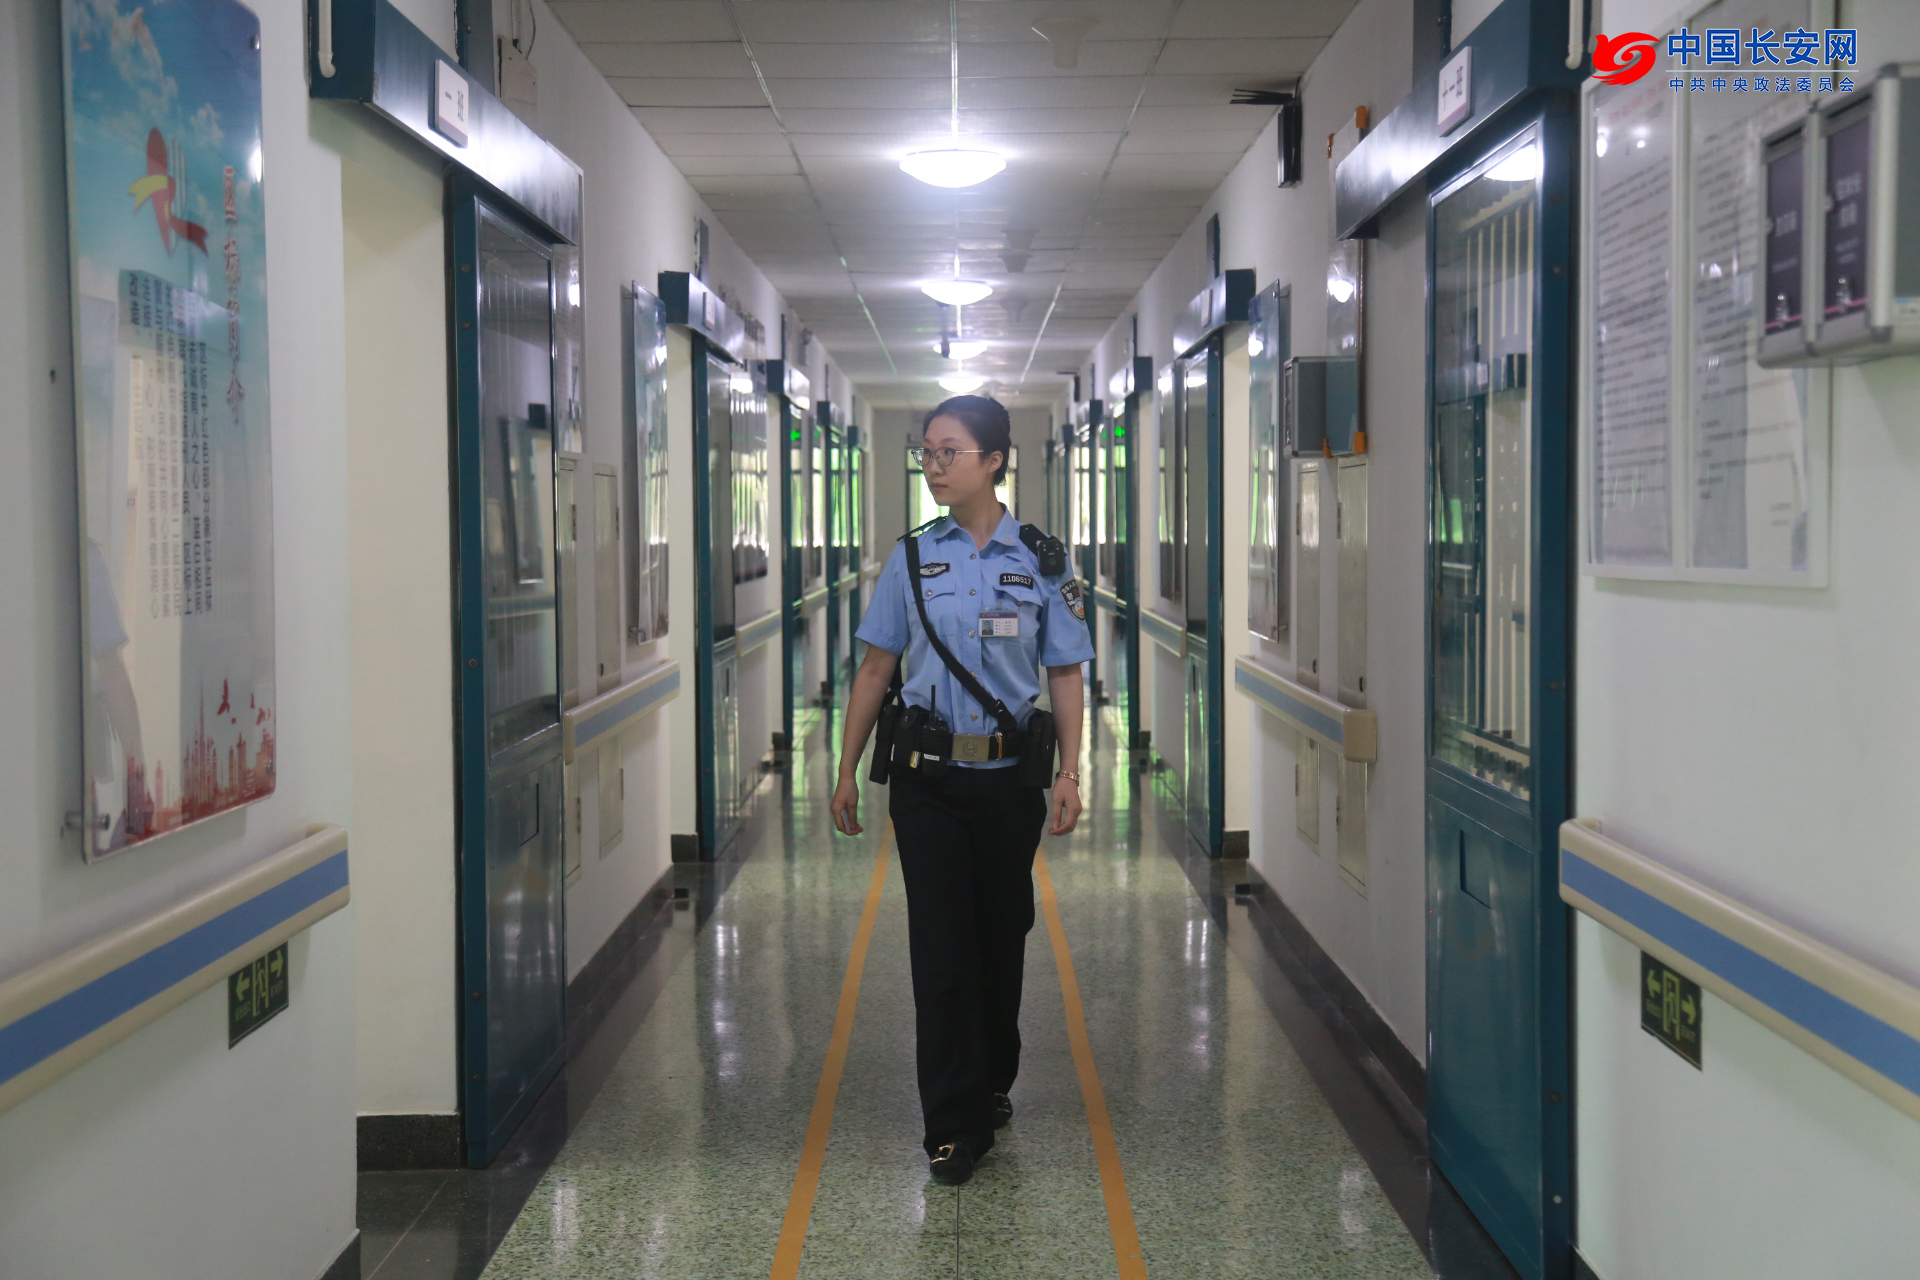 vr体验馆,谋生技能get……带你走进北京女子监狱